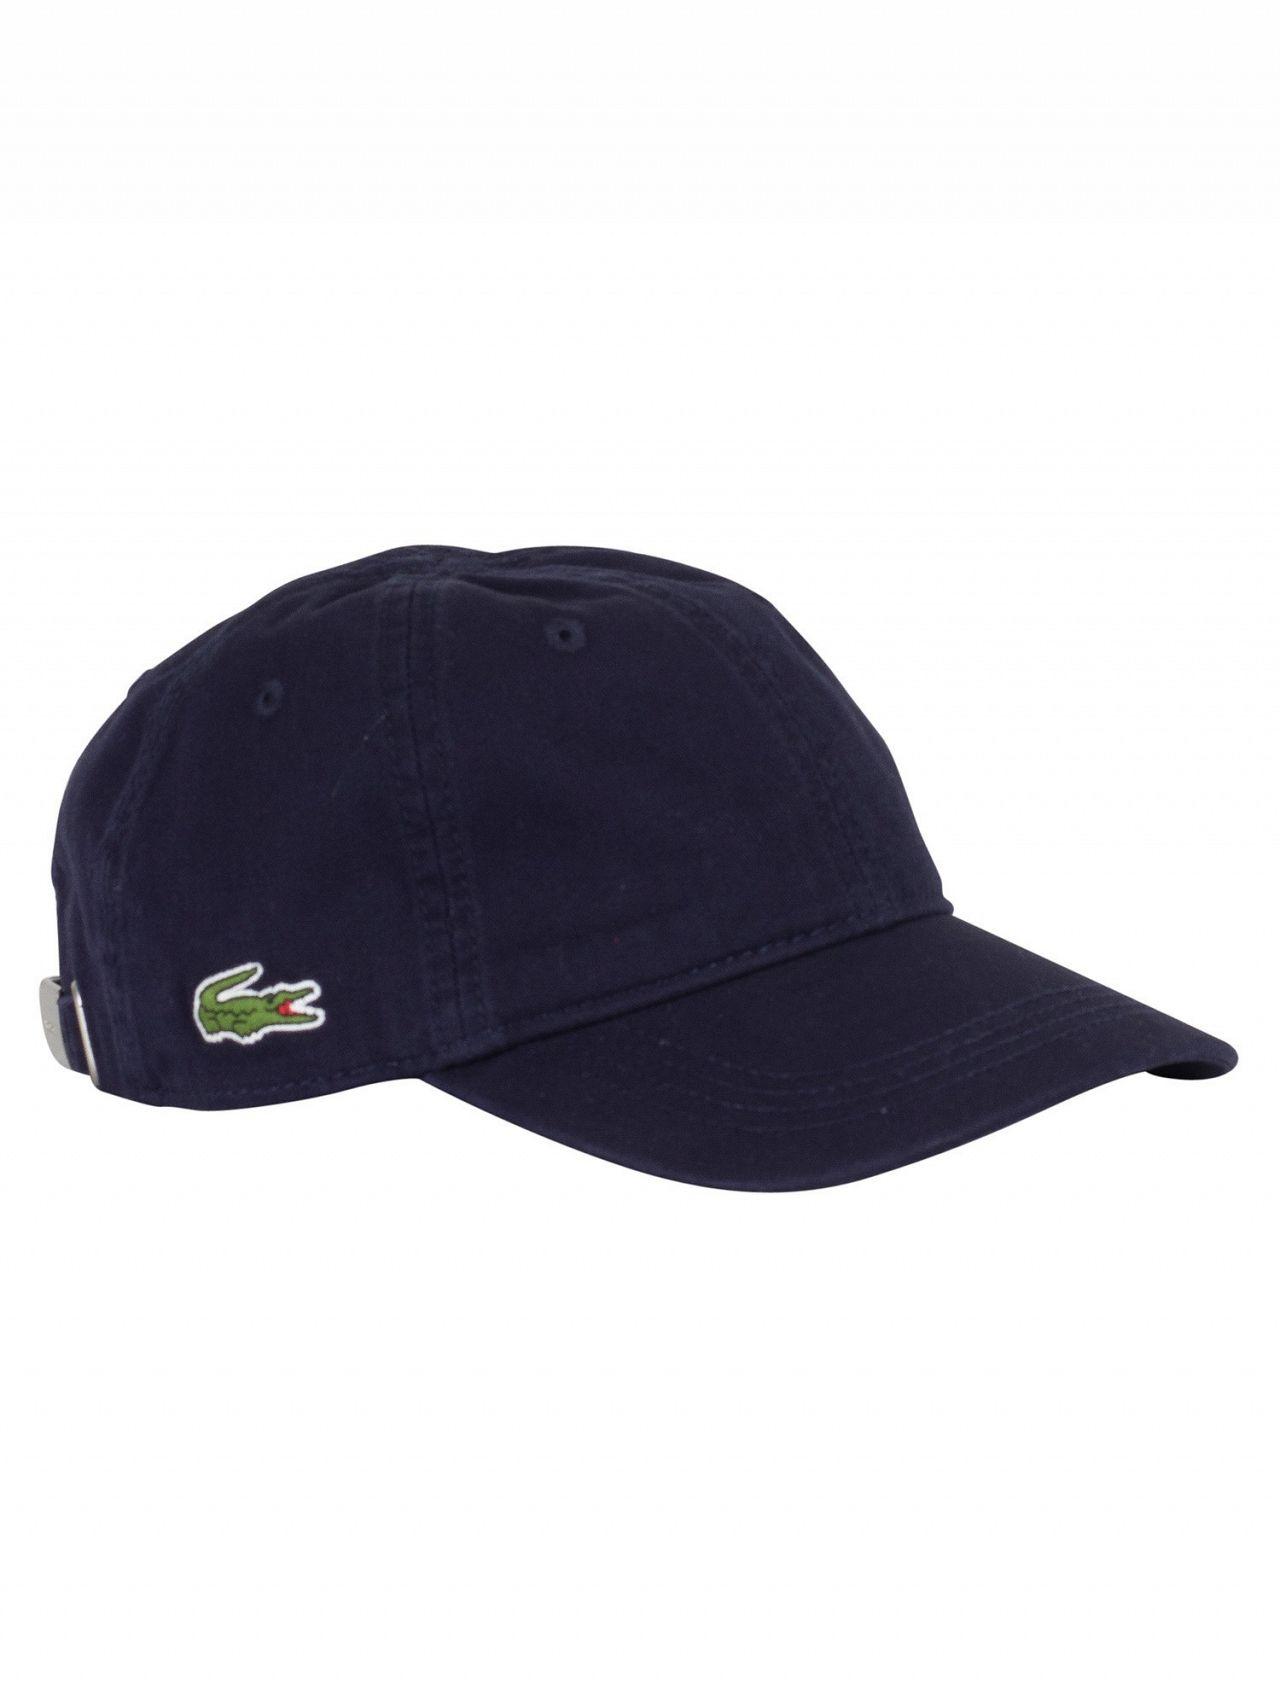 Lacoste Marine Small Logo Baseball Cap. Tap to expand 0d17c1e3b63